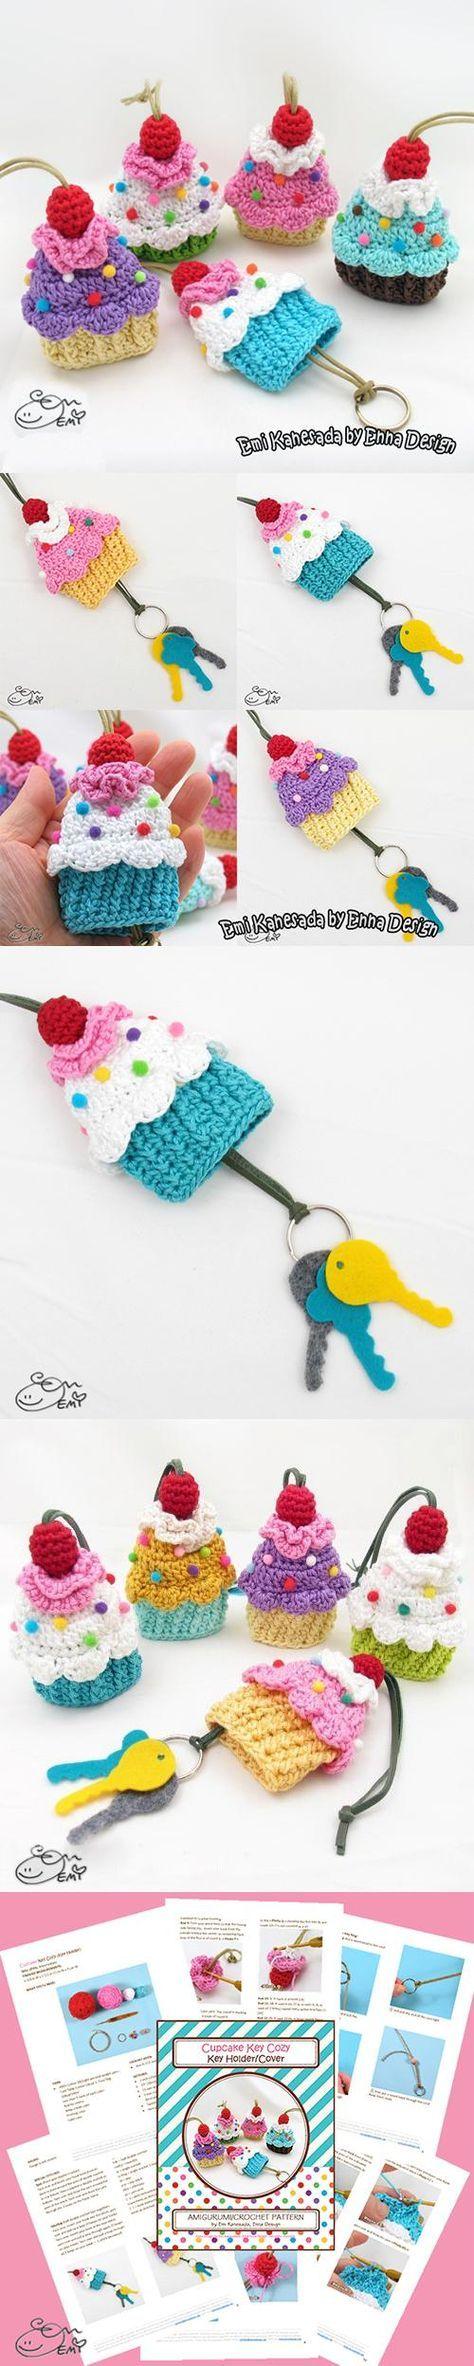 Cupcake key cozy crochet pattern by Emi Kanesada (Enna Design ...